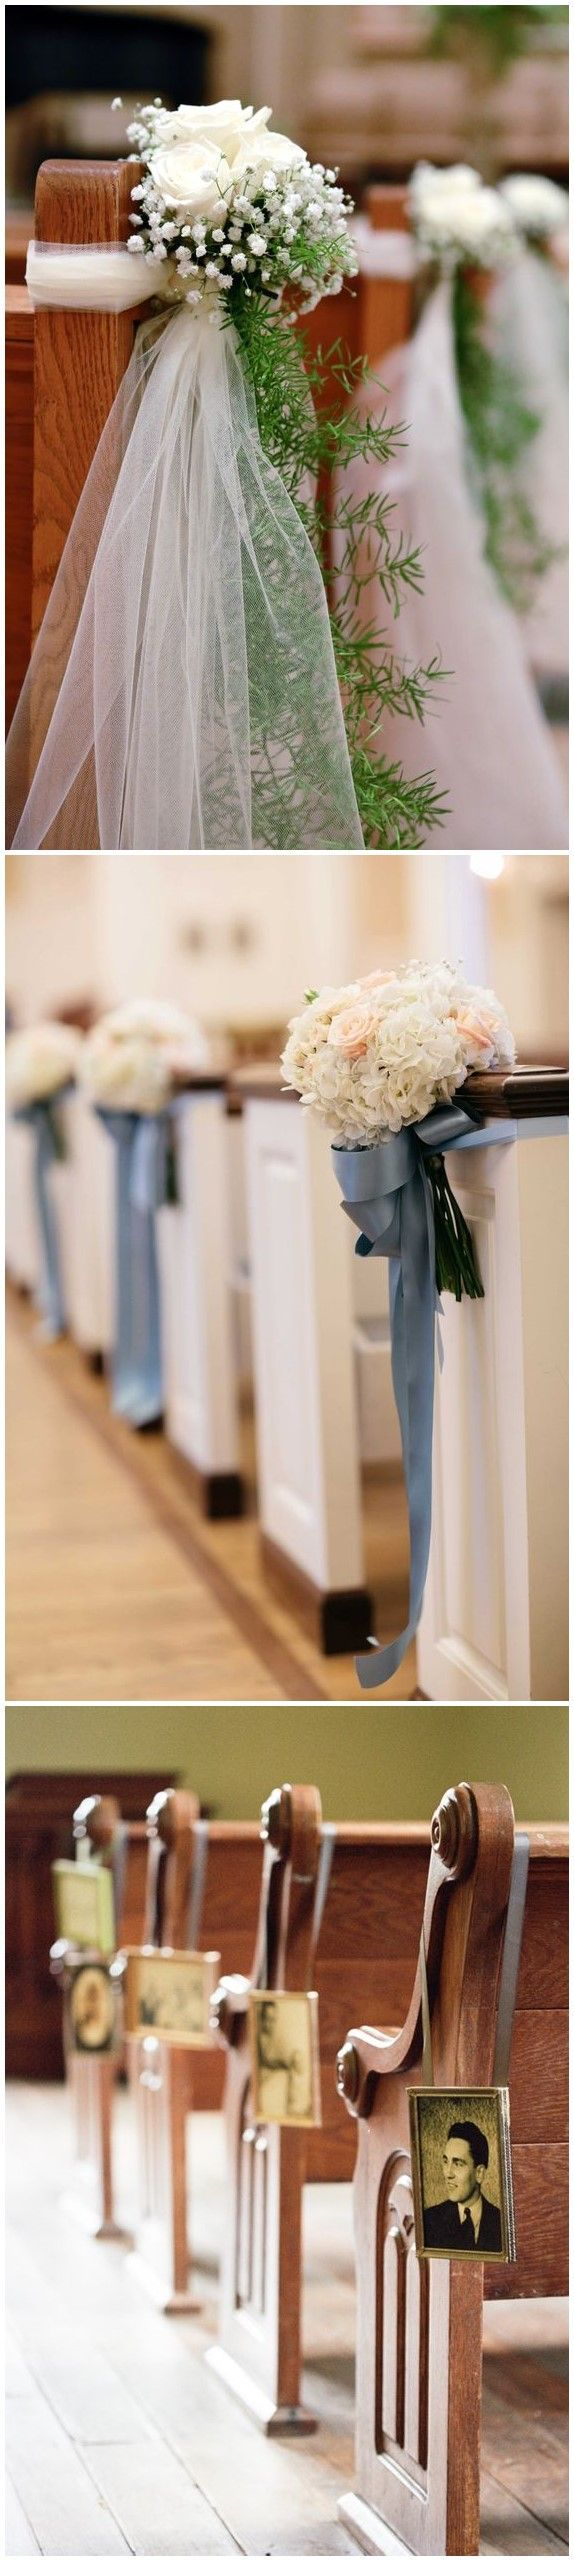 21 stunning church wedding aisle decoration ideas to steal wedding decorations 21 stunning church wedding aisle decoration ideas to steal see more junglespirit Images